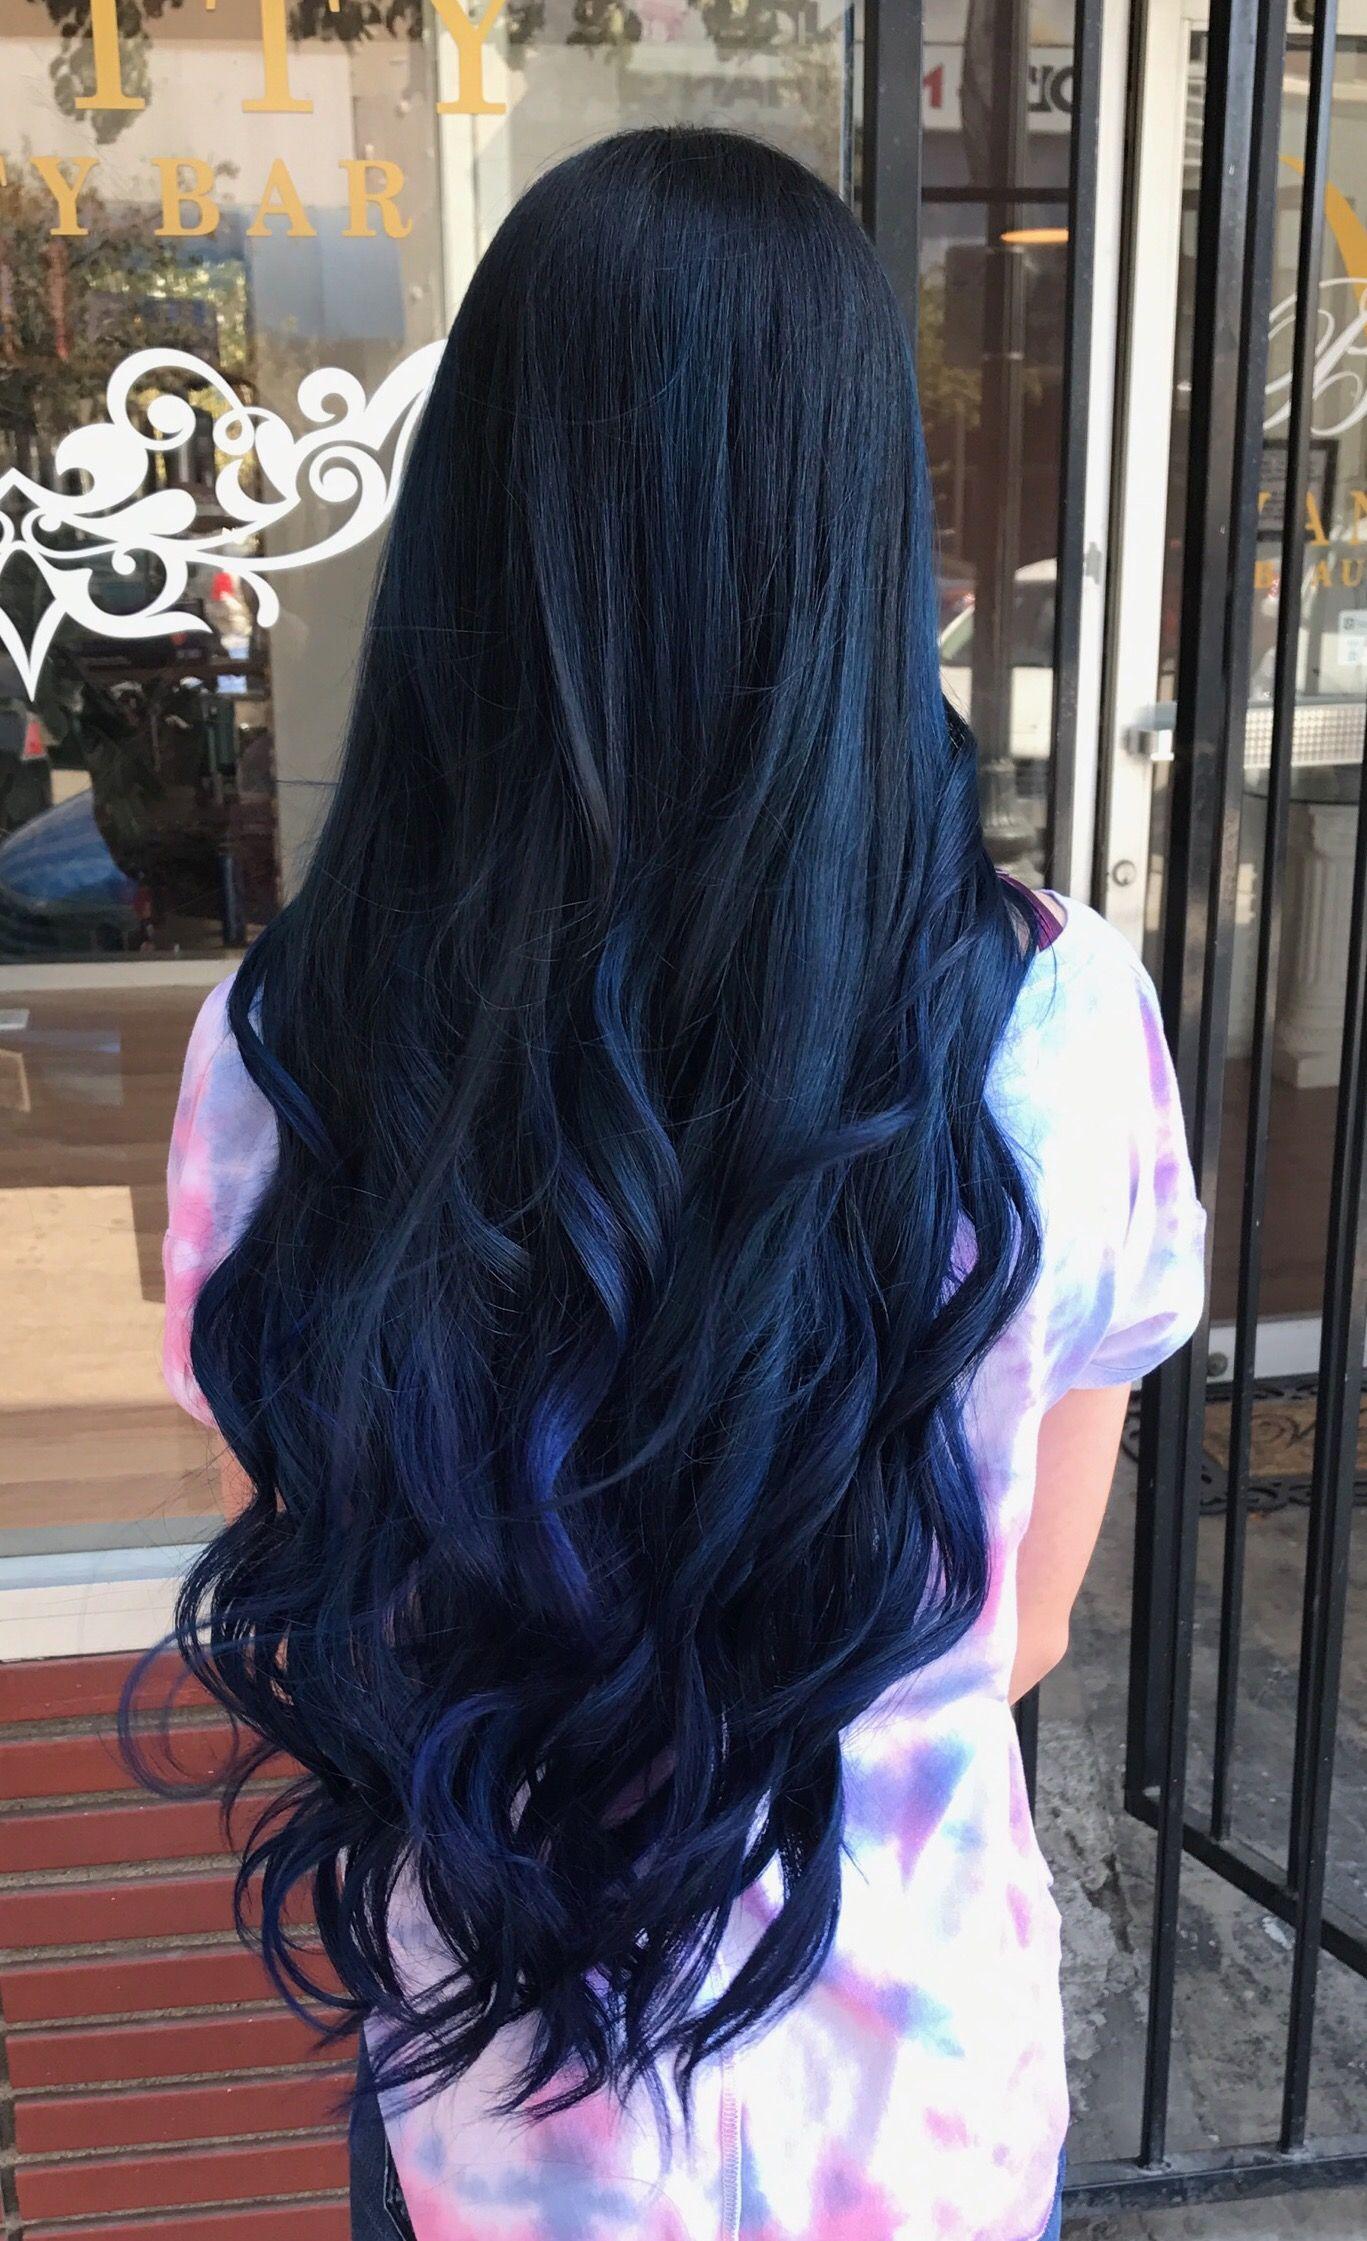 Blue Dyed Hair Hair Styles Dyed Hair Raw Hair